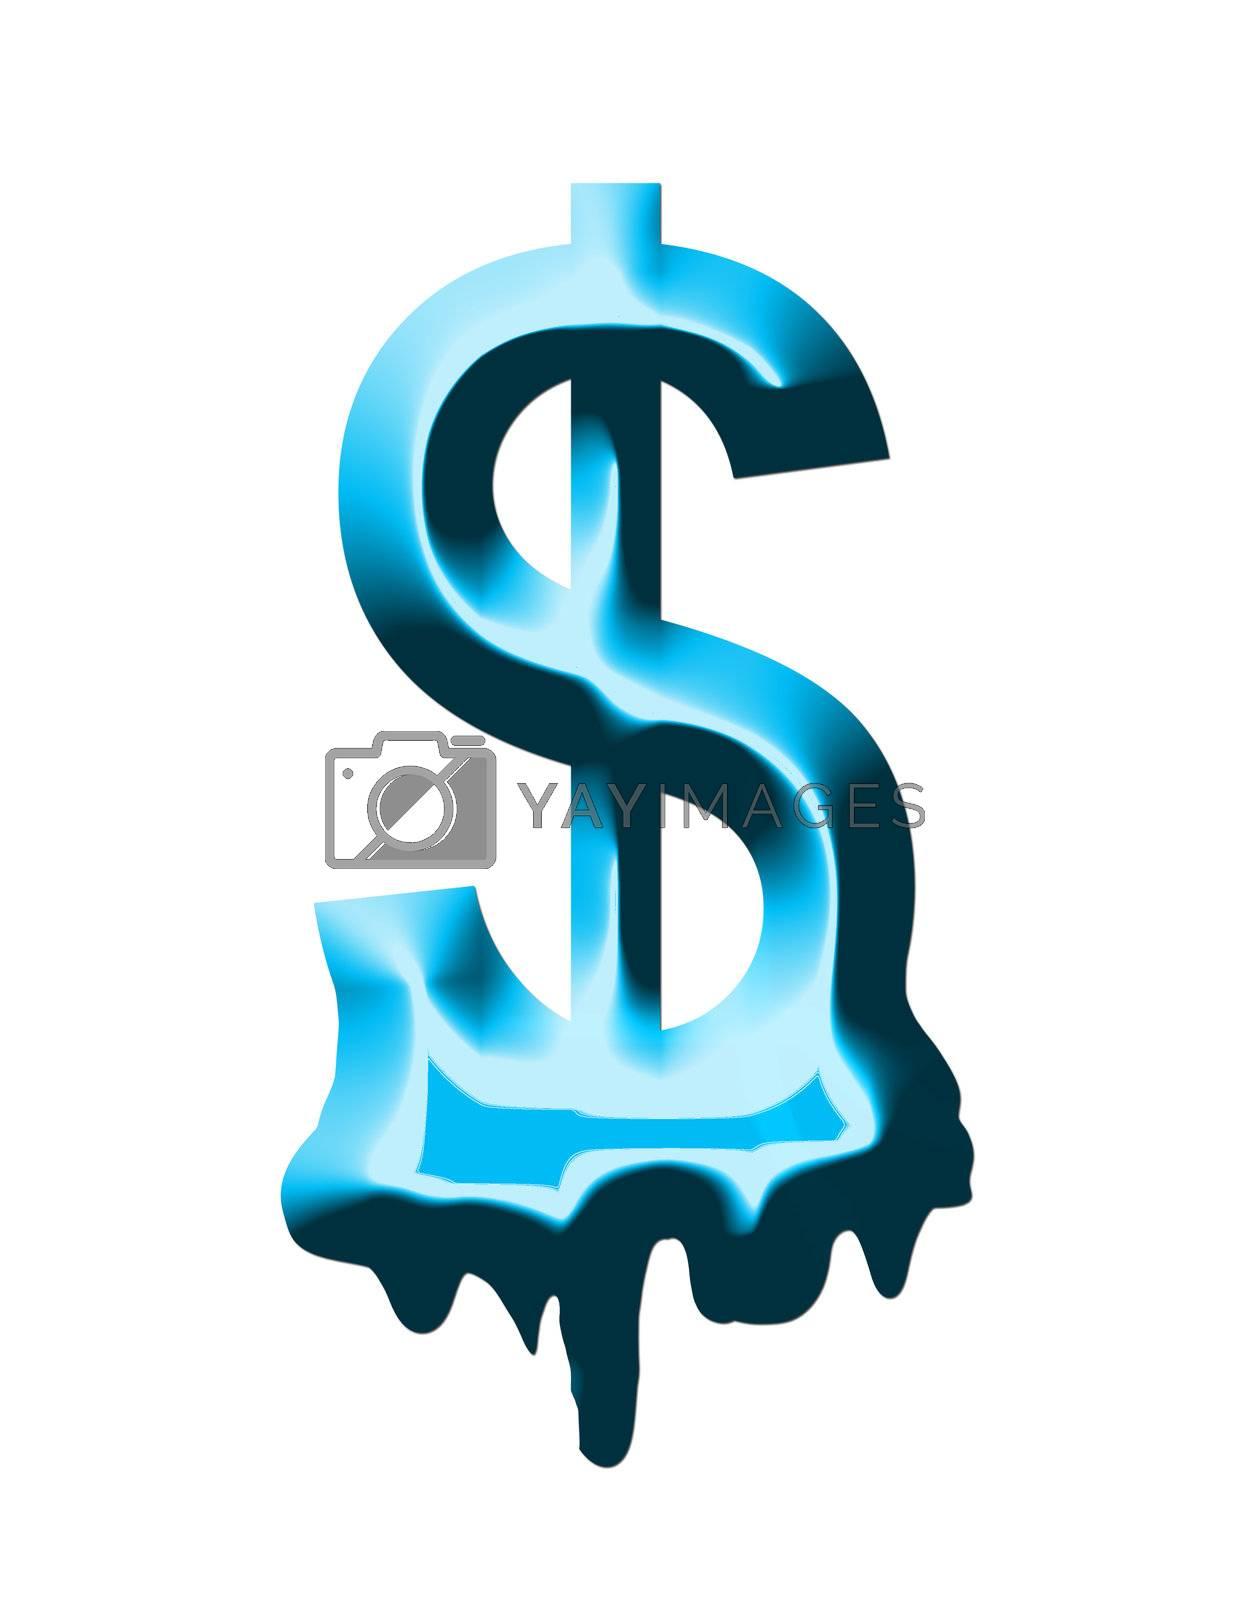 money blue sign on white background to melt